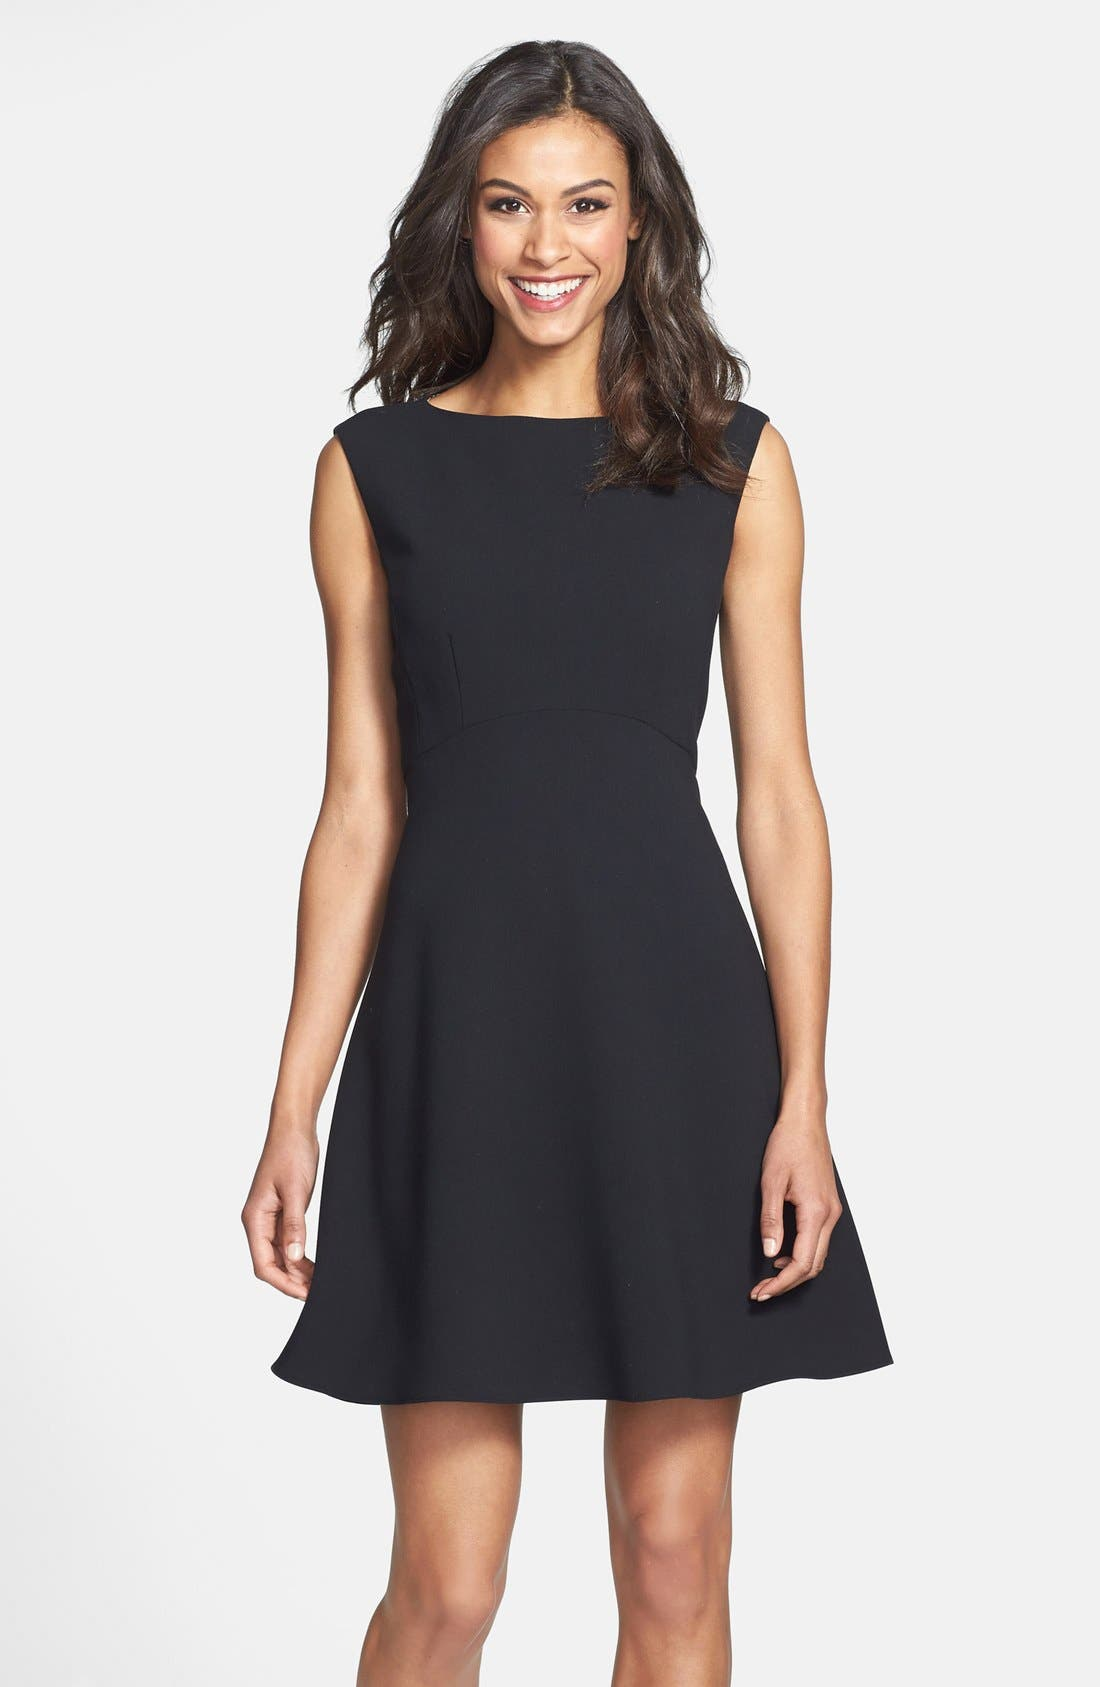 Alternate Image 1 Selected - Tahari Empire Waist Fit & Flare Dress